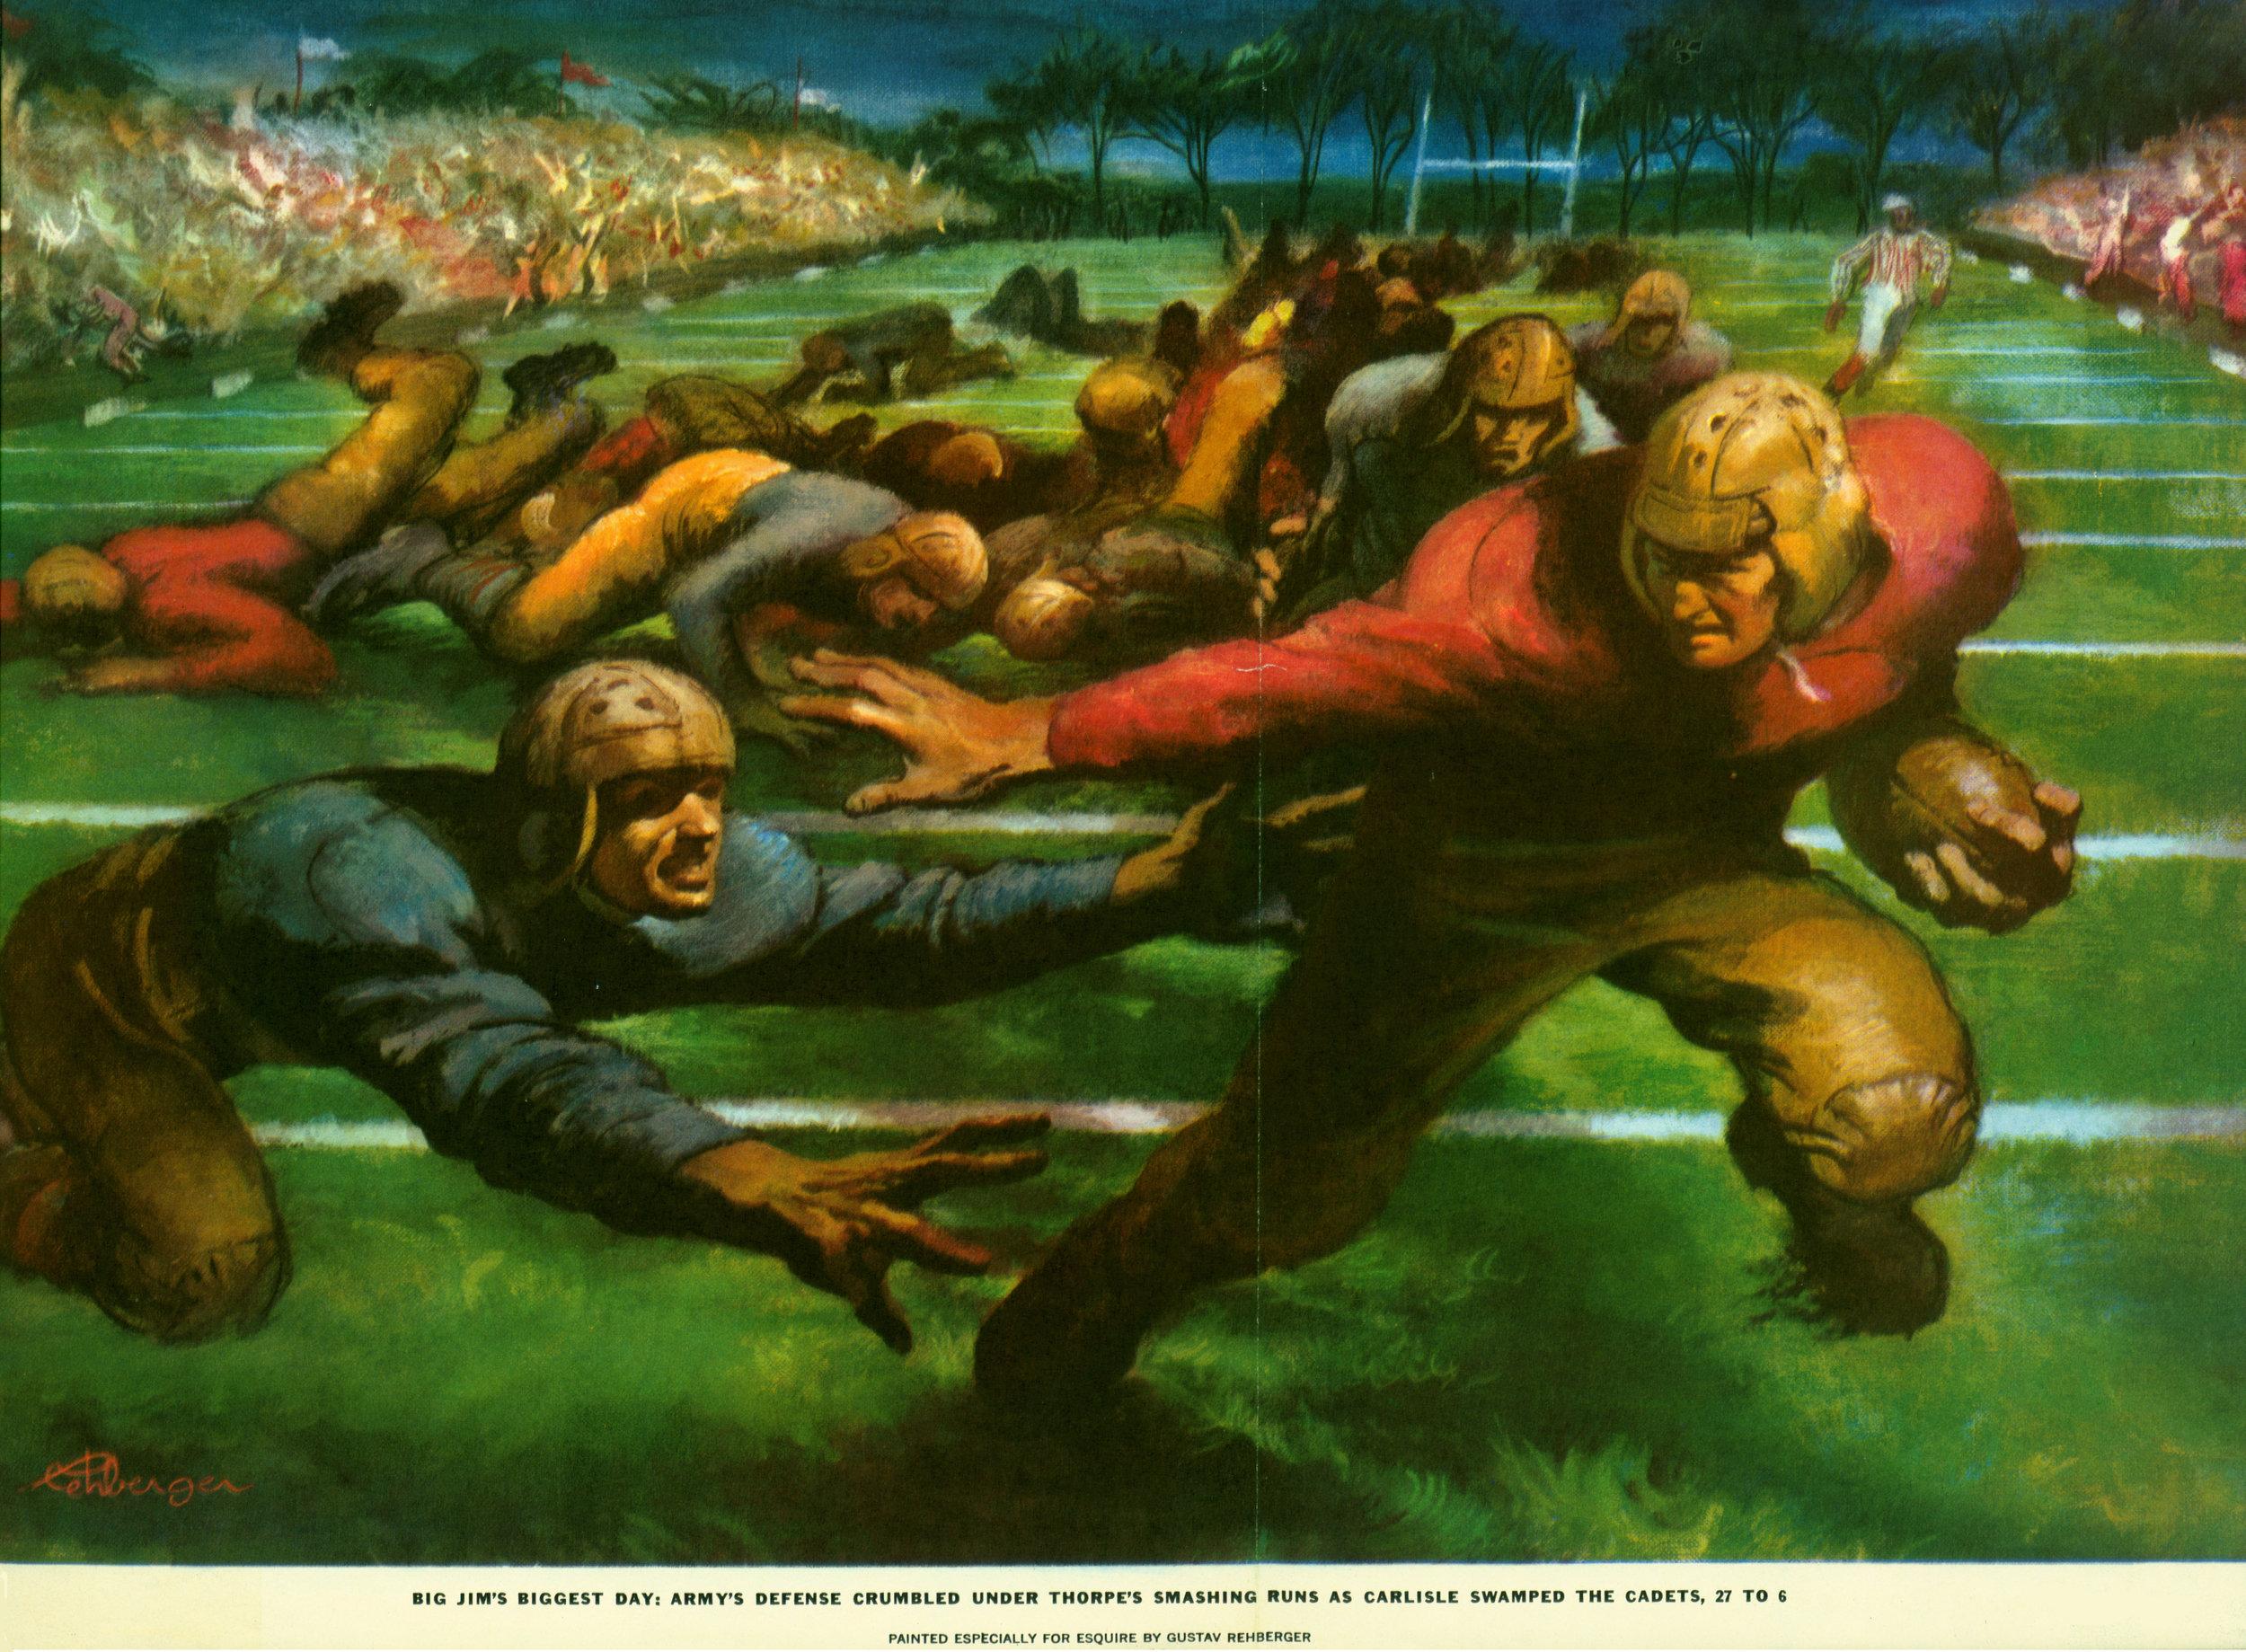 September 1952 - Carlisle Swamps the Cadets (Gatefold)